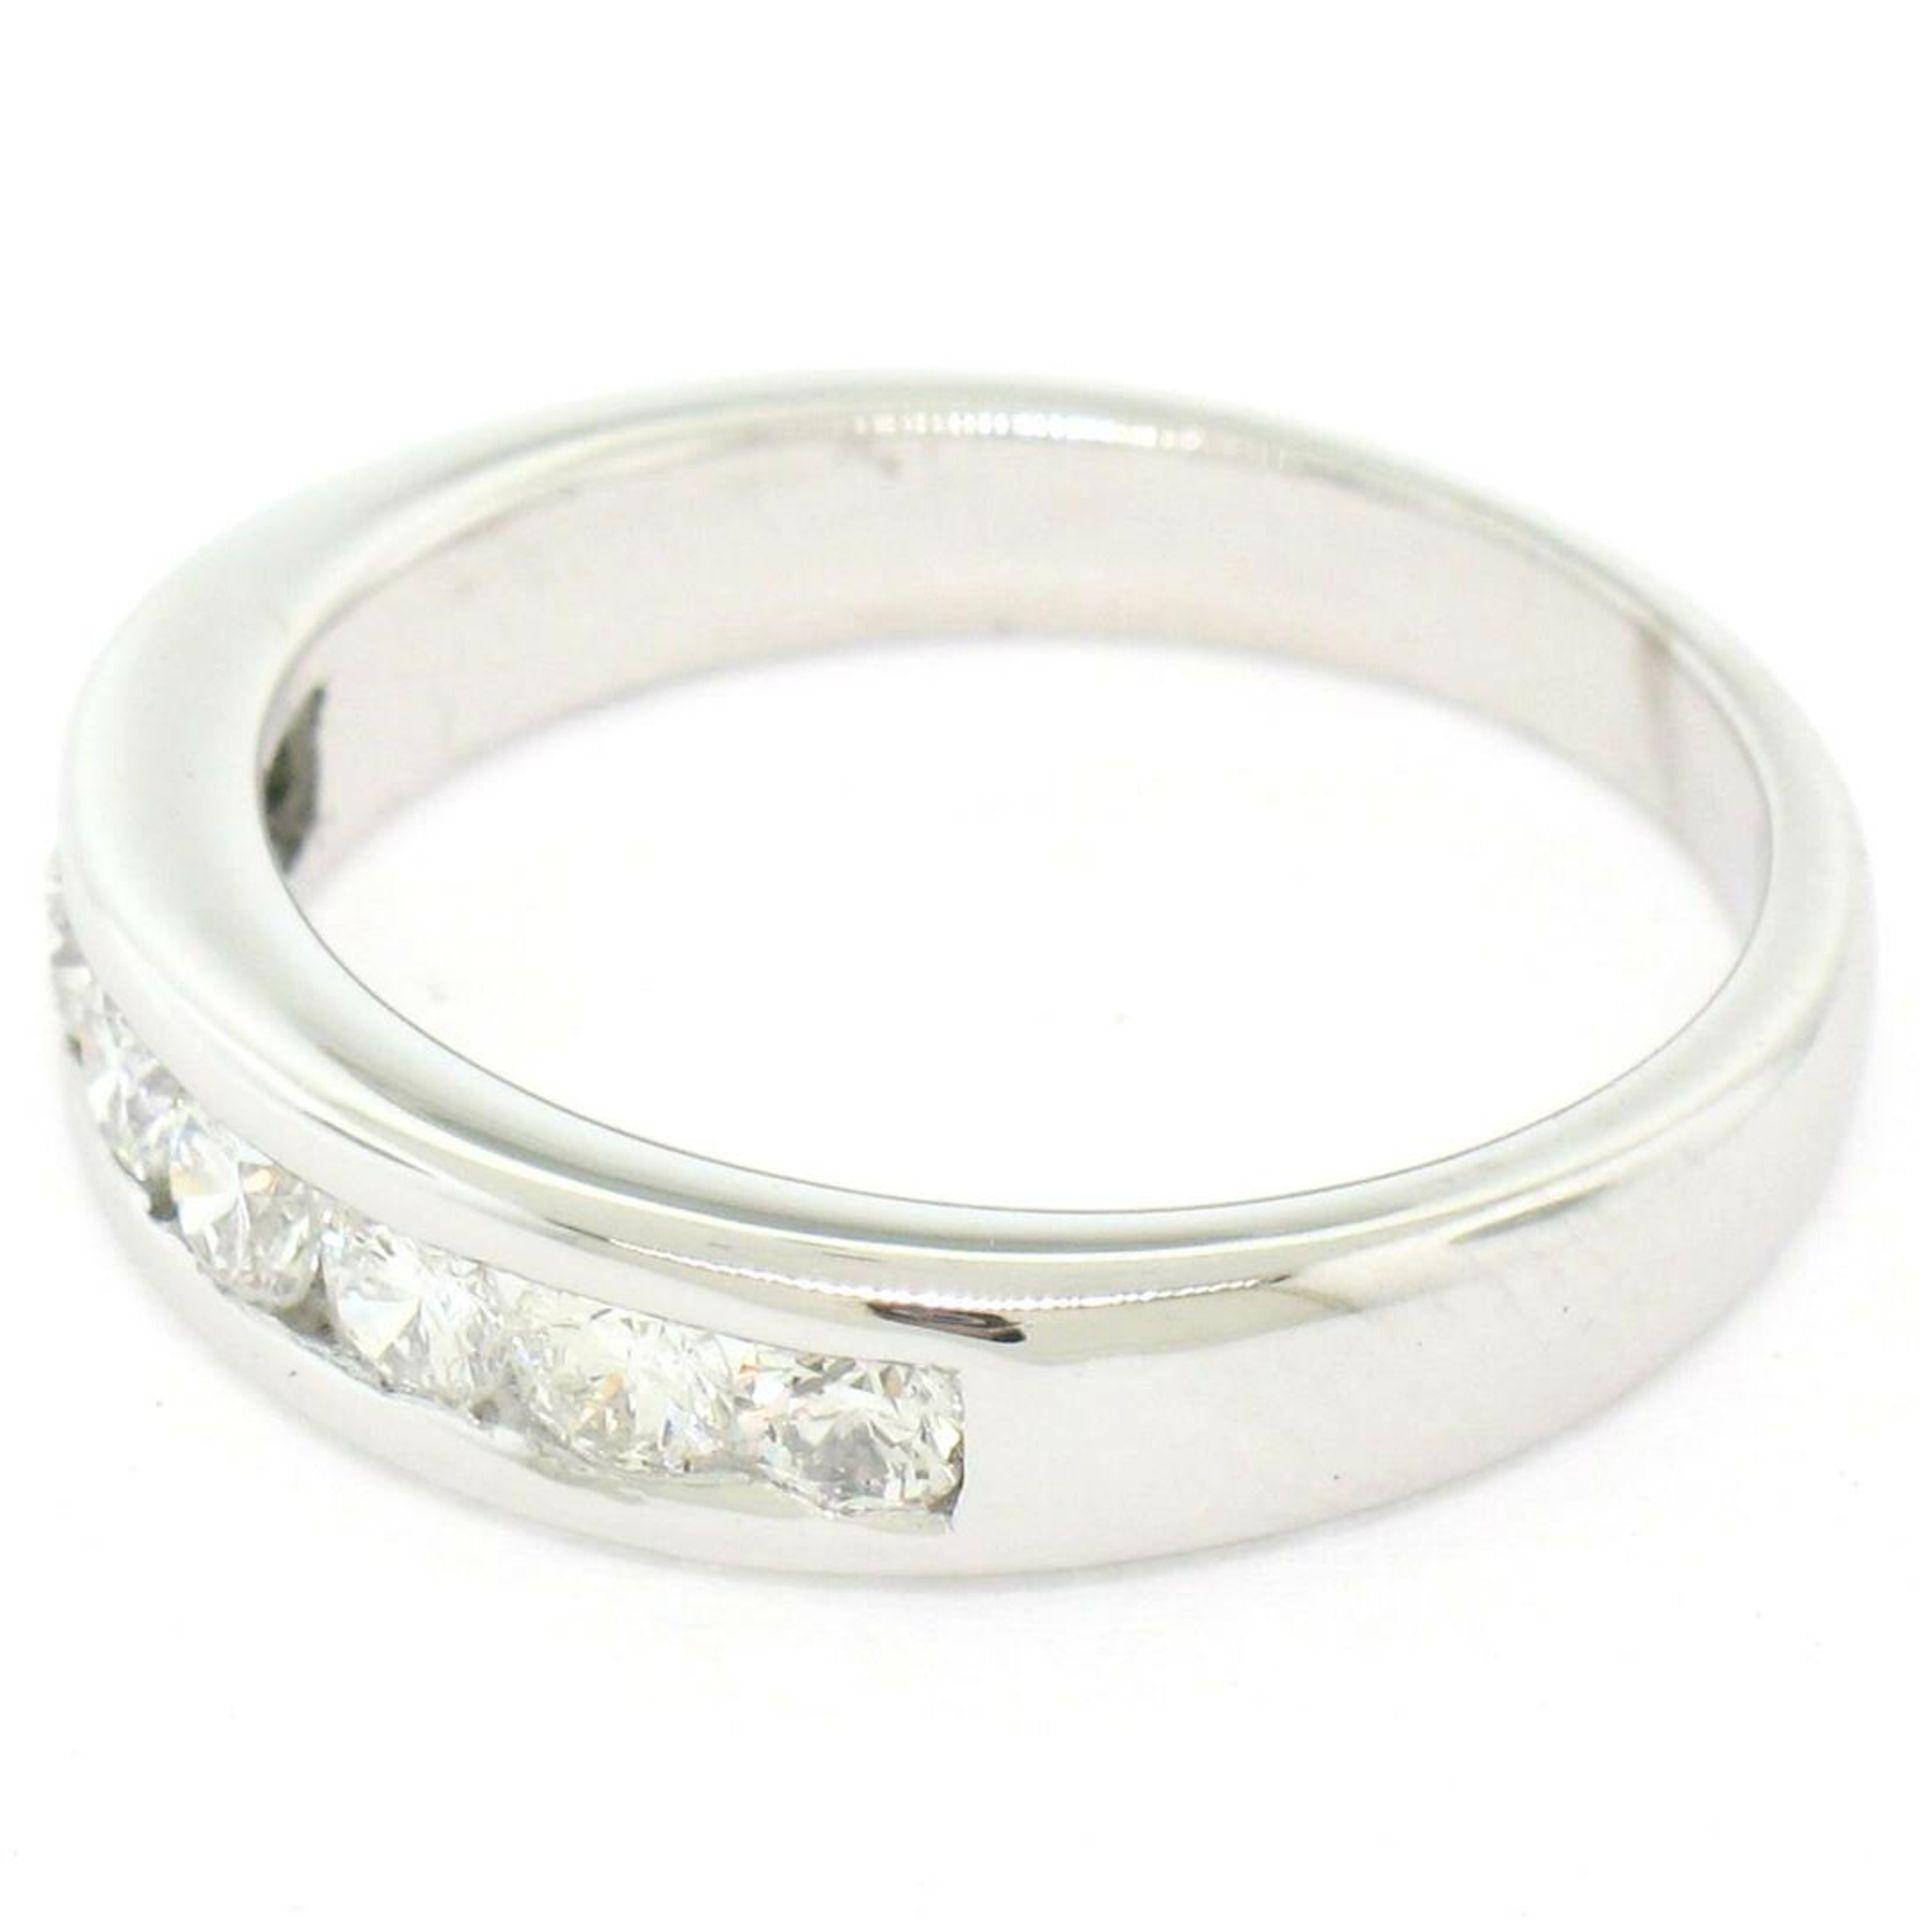 Classic Platinum .80ctw Channel Set Round Brilliant VS Diamond Wedding Band Ring - Image 5 of 8